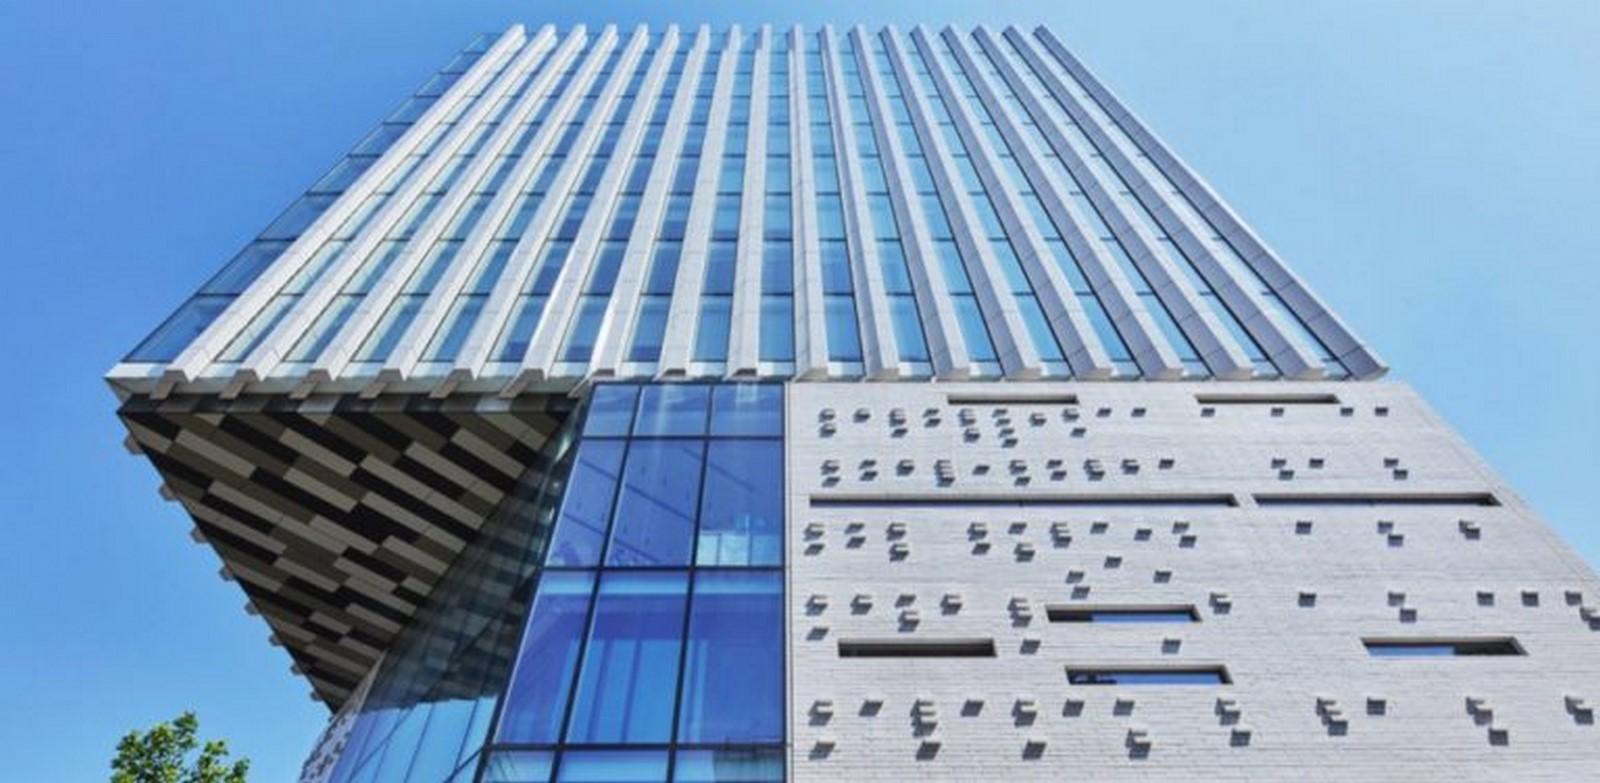 Educational Buildings -The Music Box Campus, London, UK Sheet1